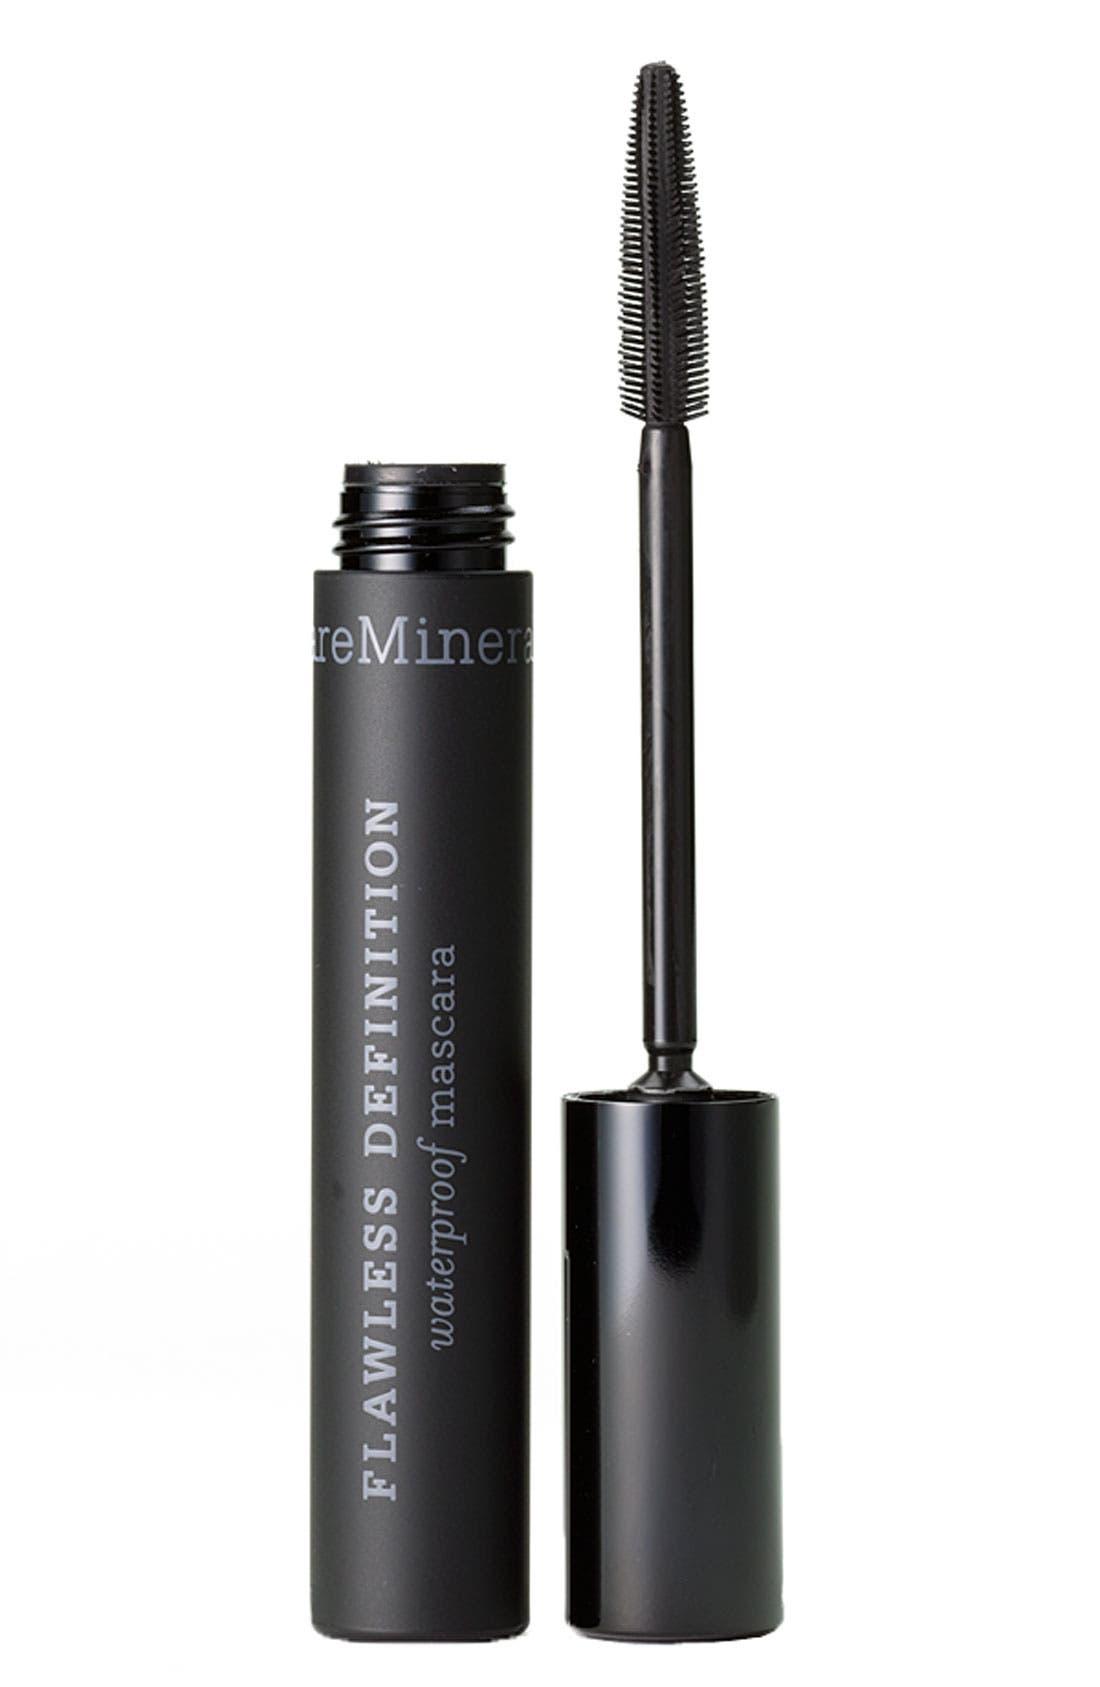 Flawless Definition Waterproof Mascara,                         Main,                         color, 001